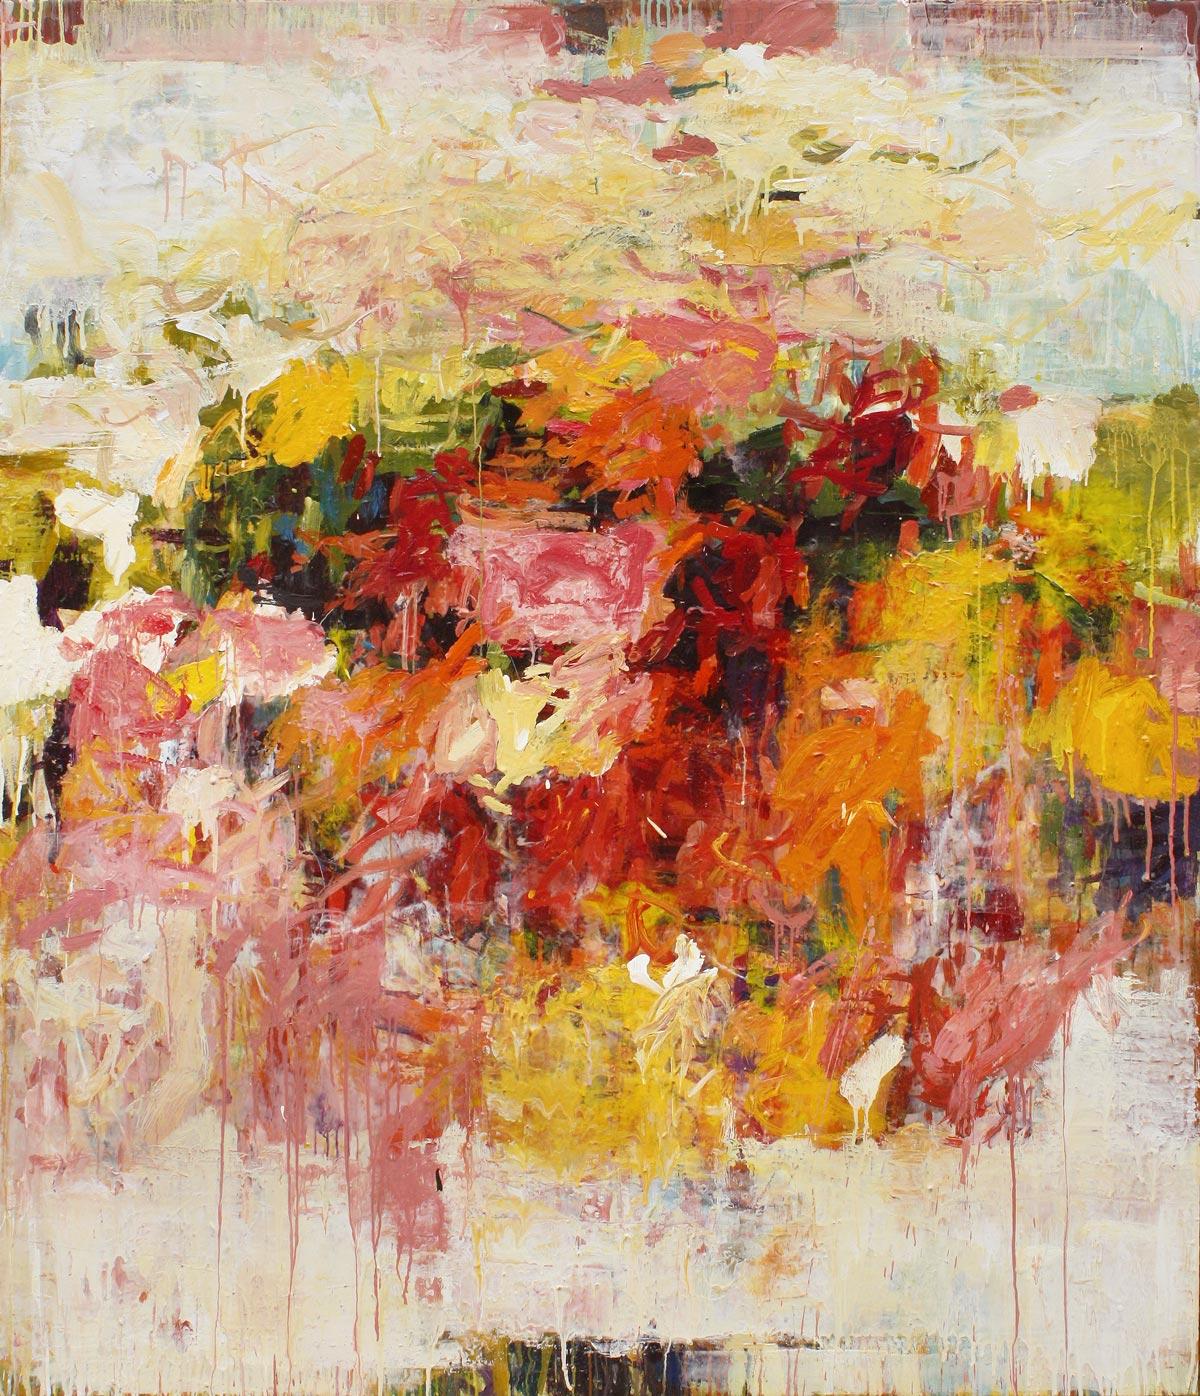 karen-silve-market-2-floral-abstract-painting.jpg